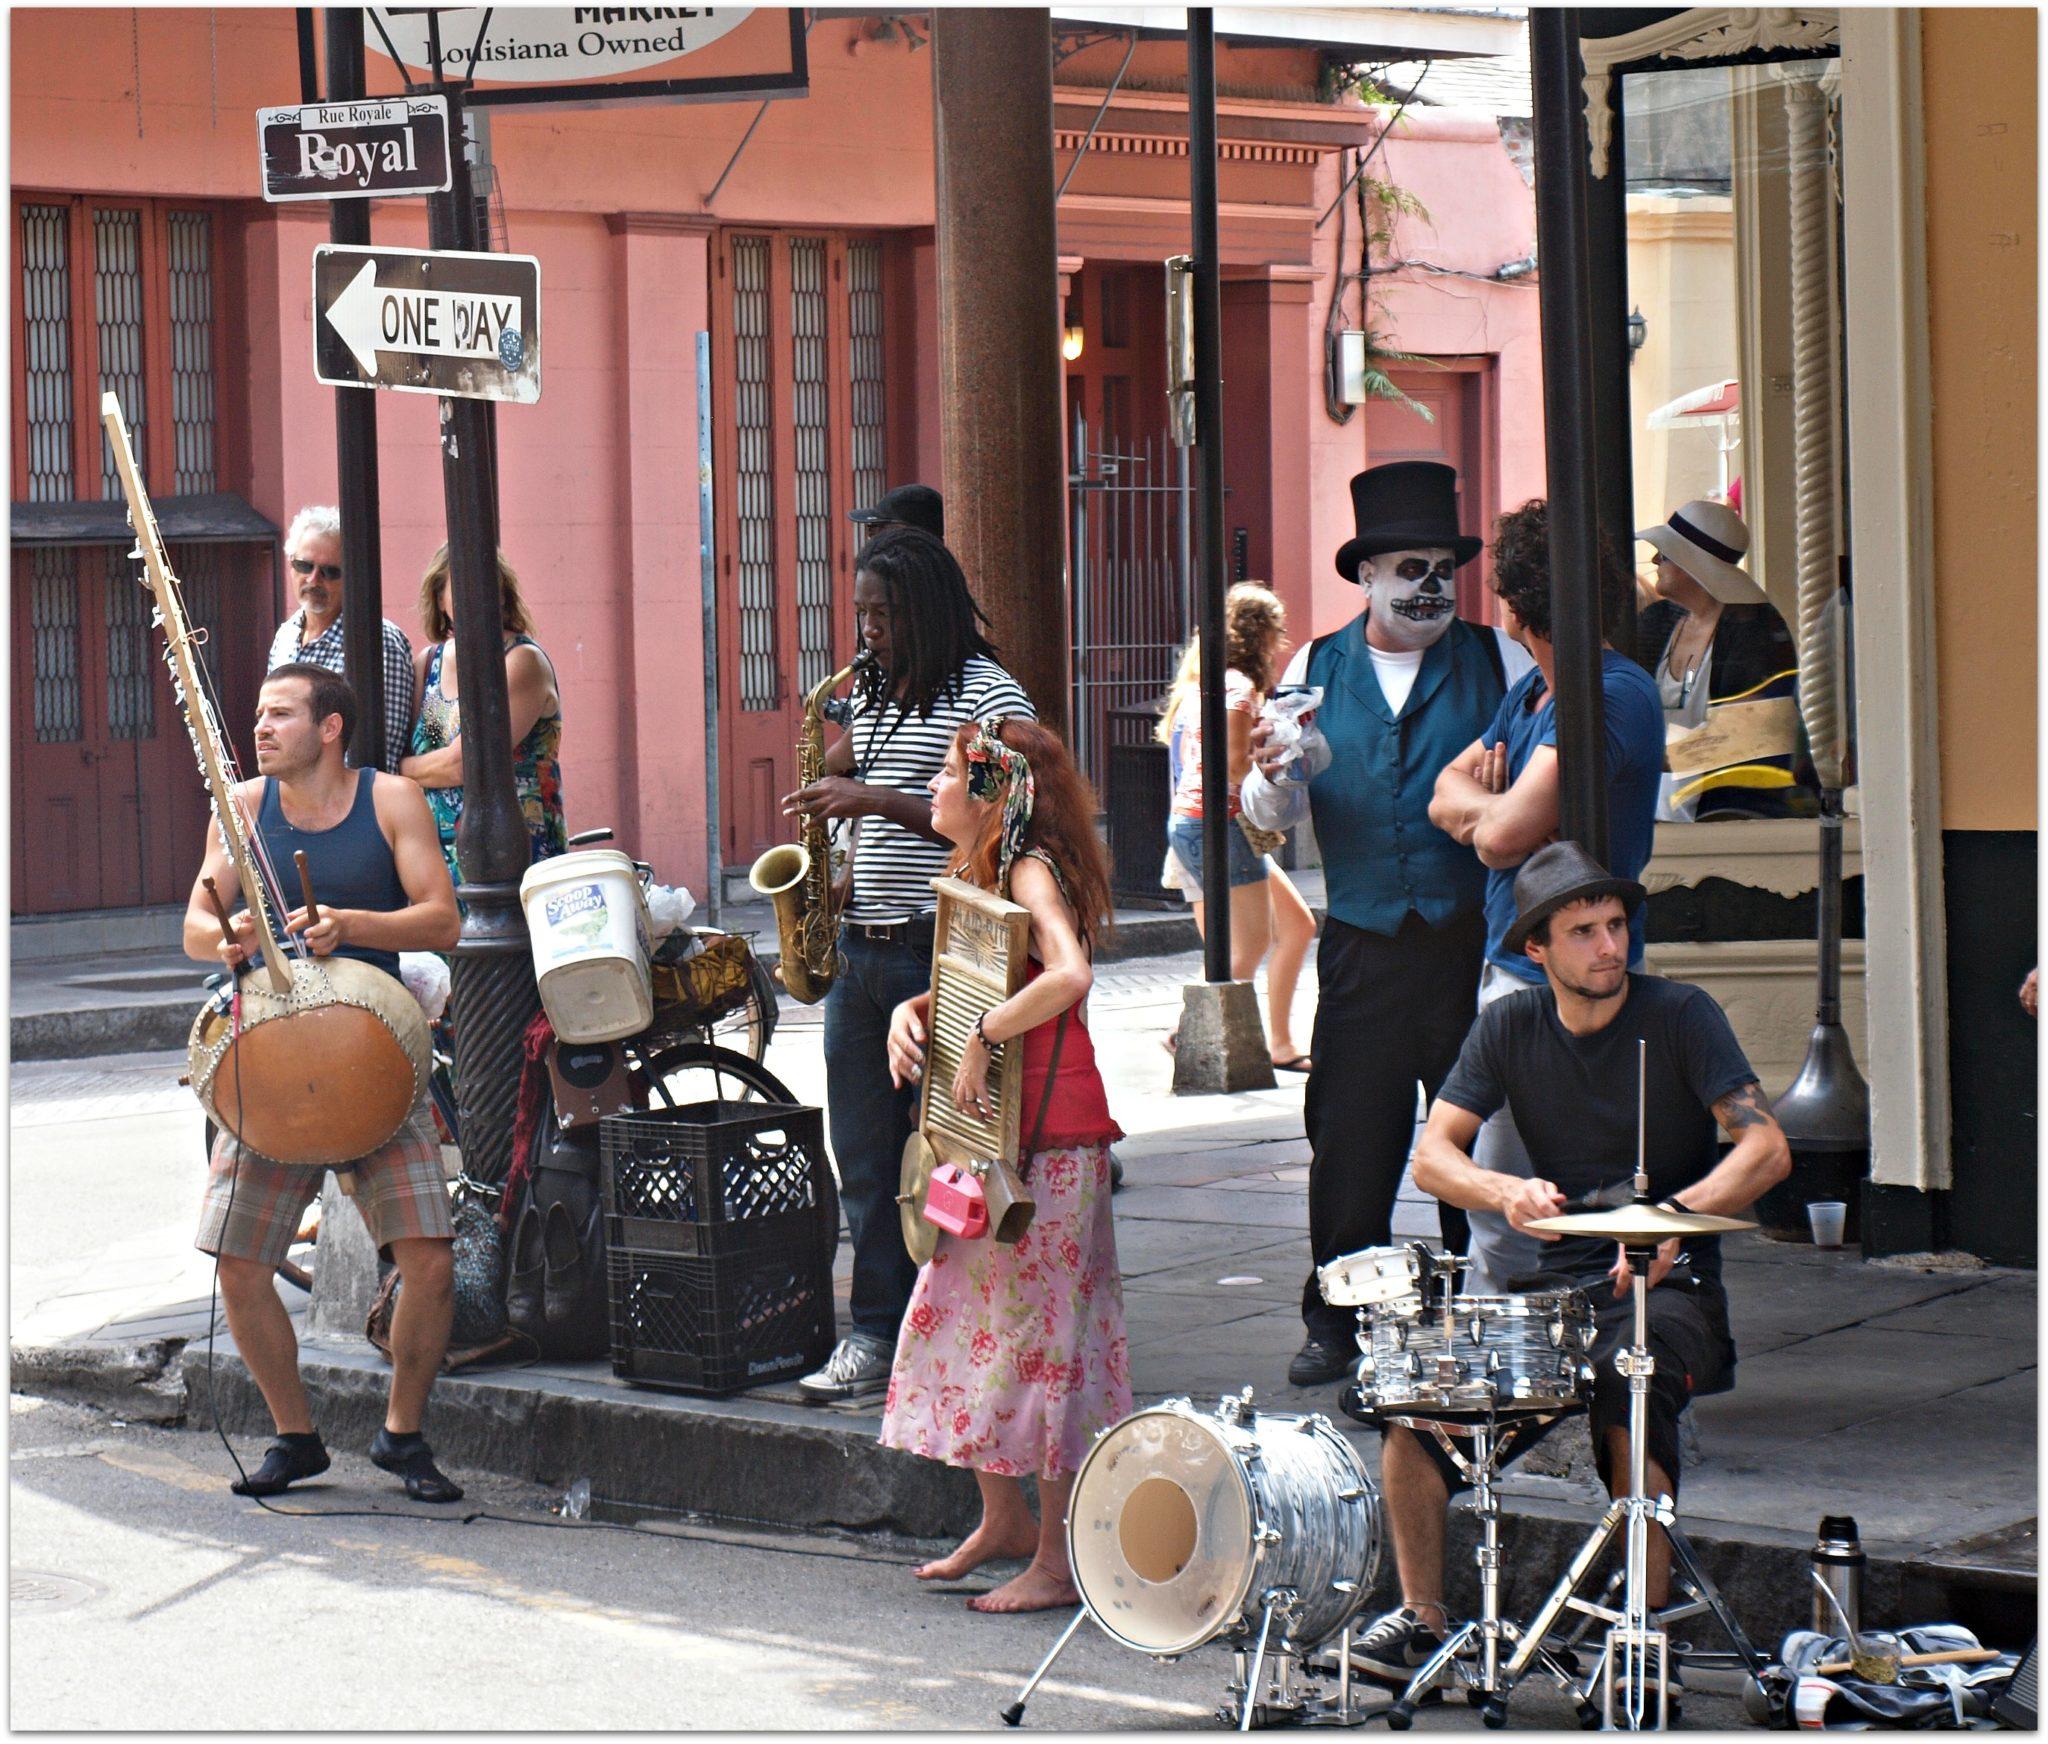 Street Music on Royal Street